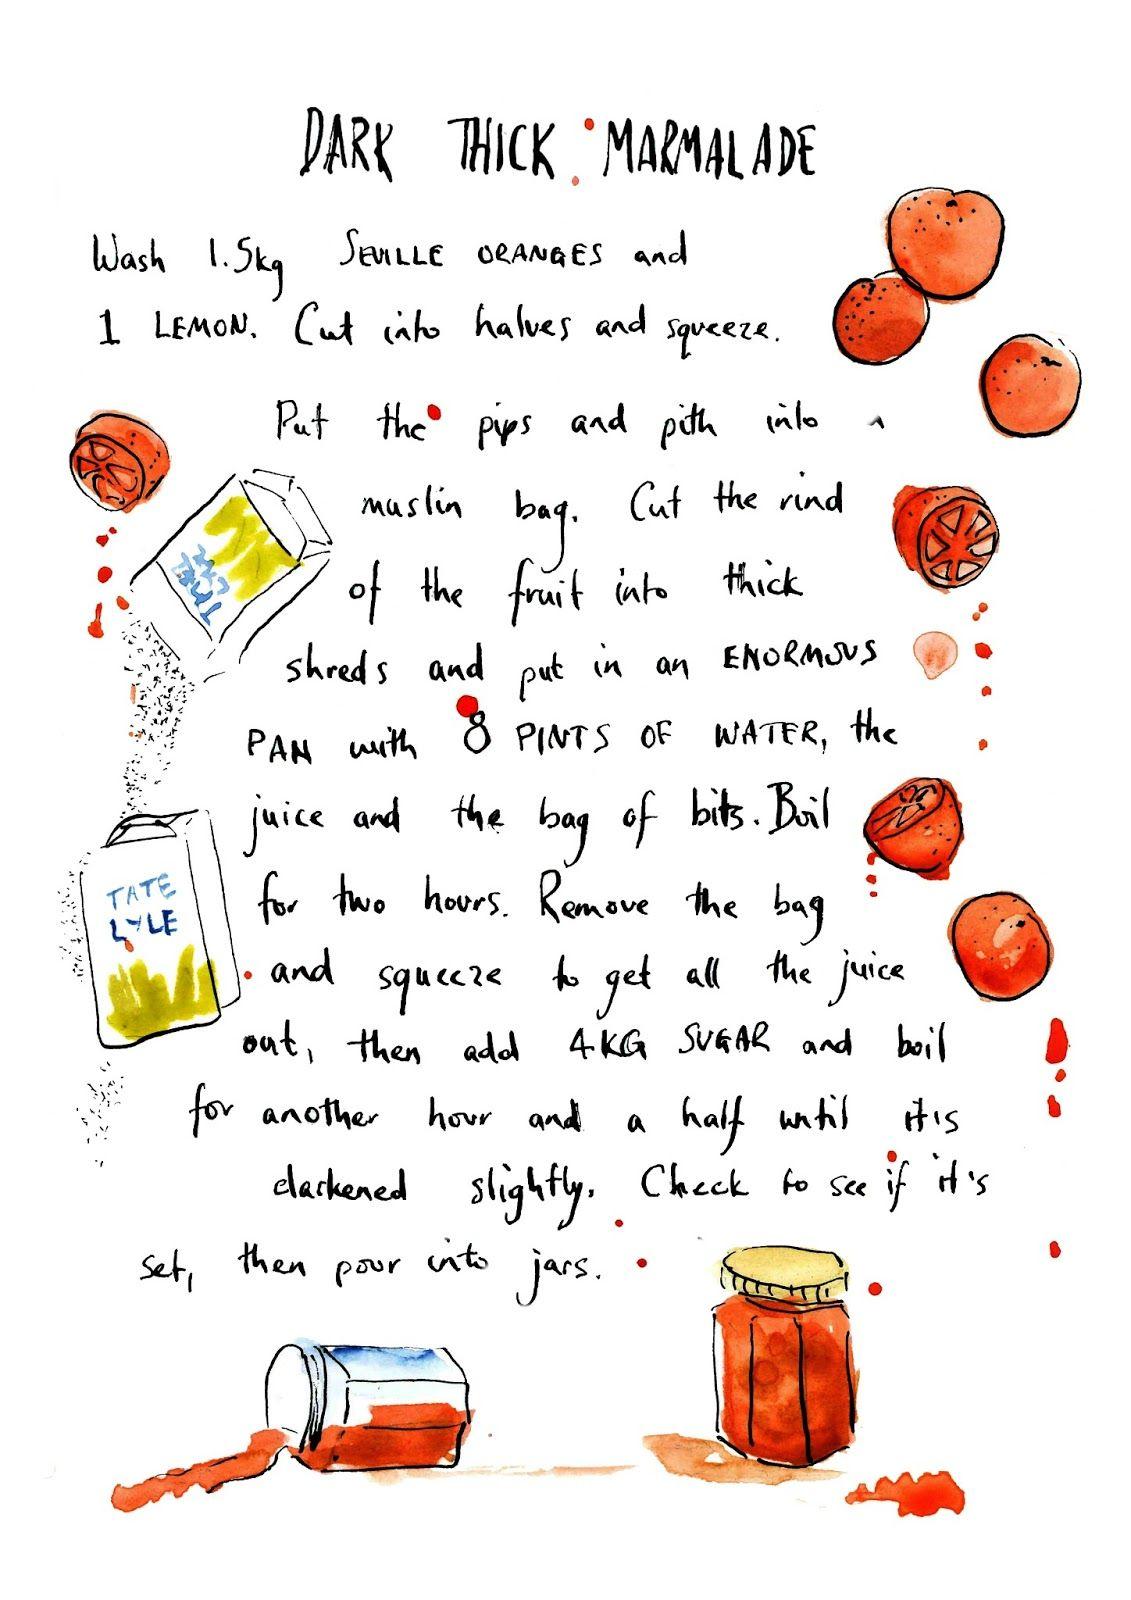 Illustrated marmalade recipe